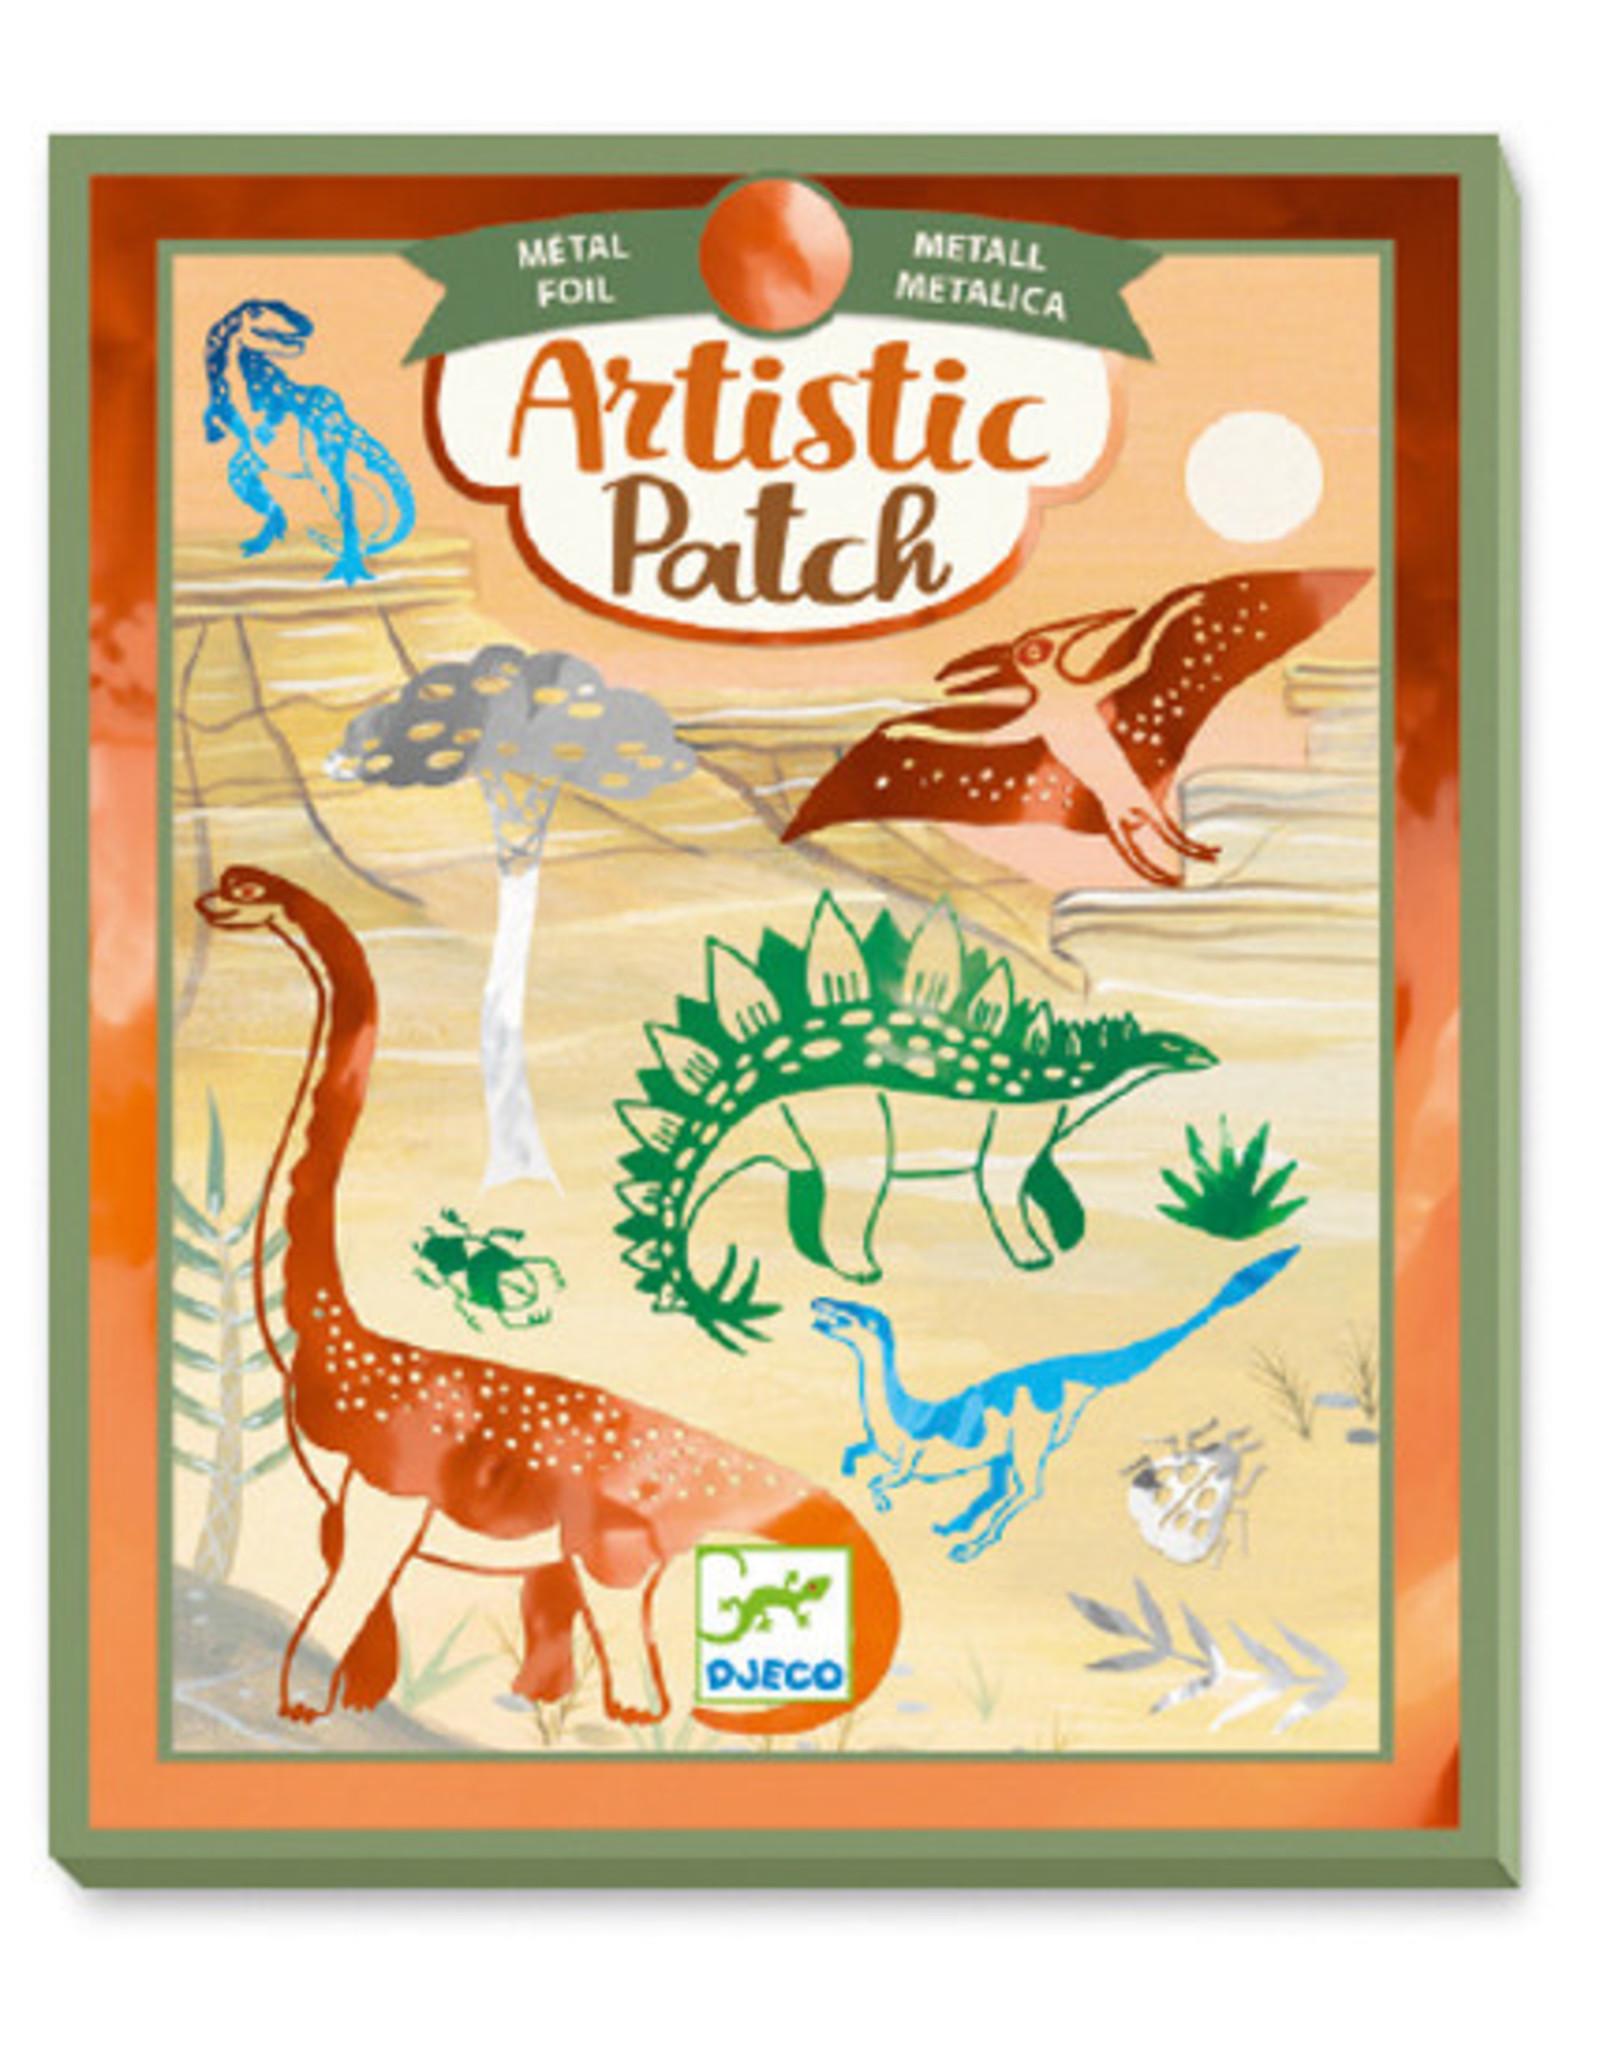 Djeco Artistic Patch Metal Foil Dinosaurs